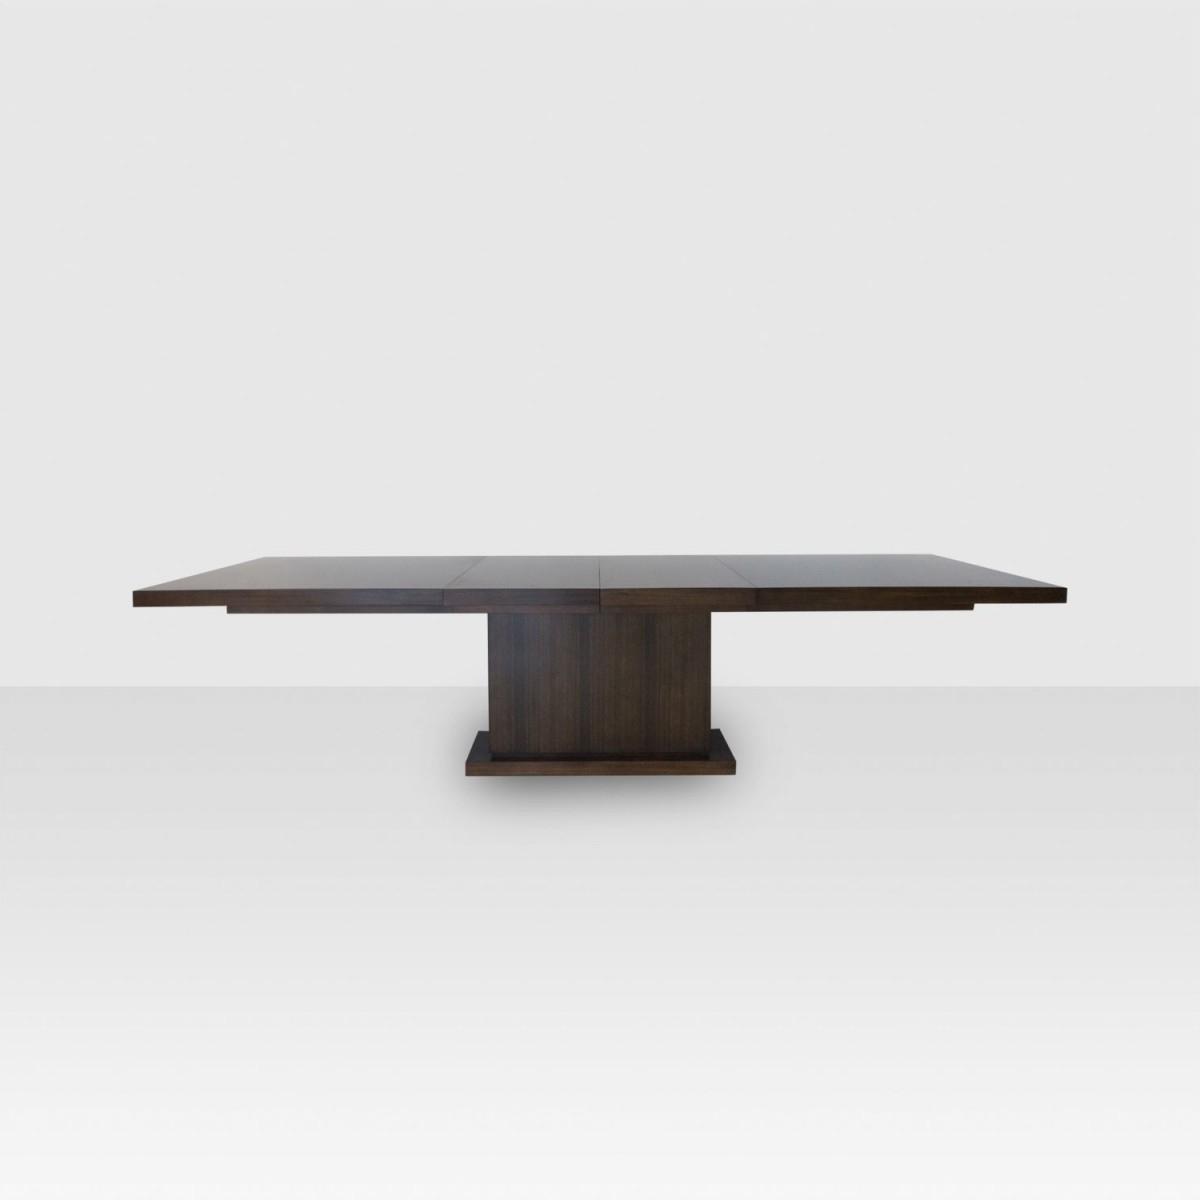 Most Recent Michael Weiss Bradford Dining Table – Elte In Bradford Dining Tables (View 13 of 25)